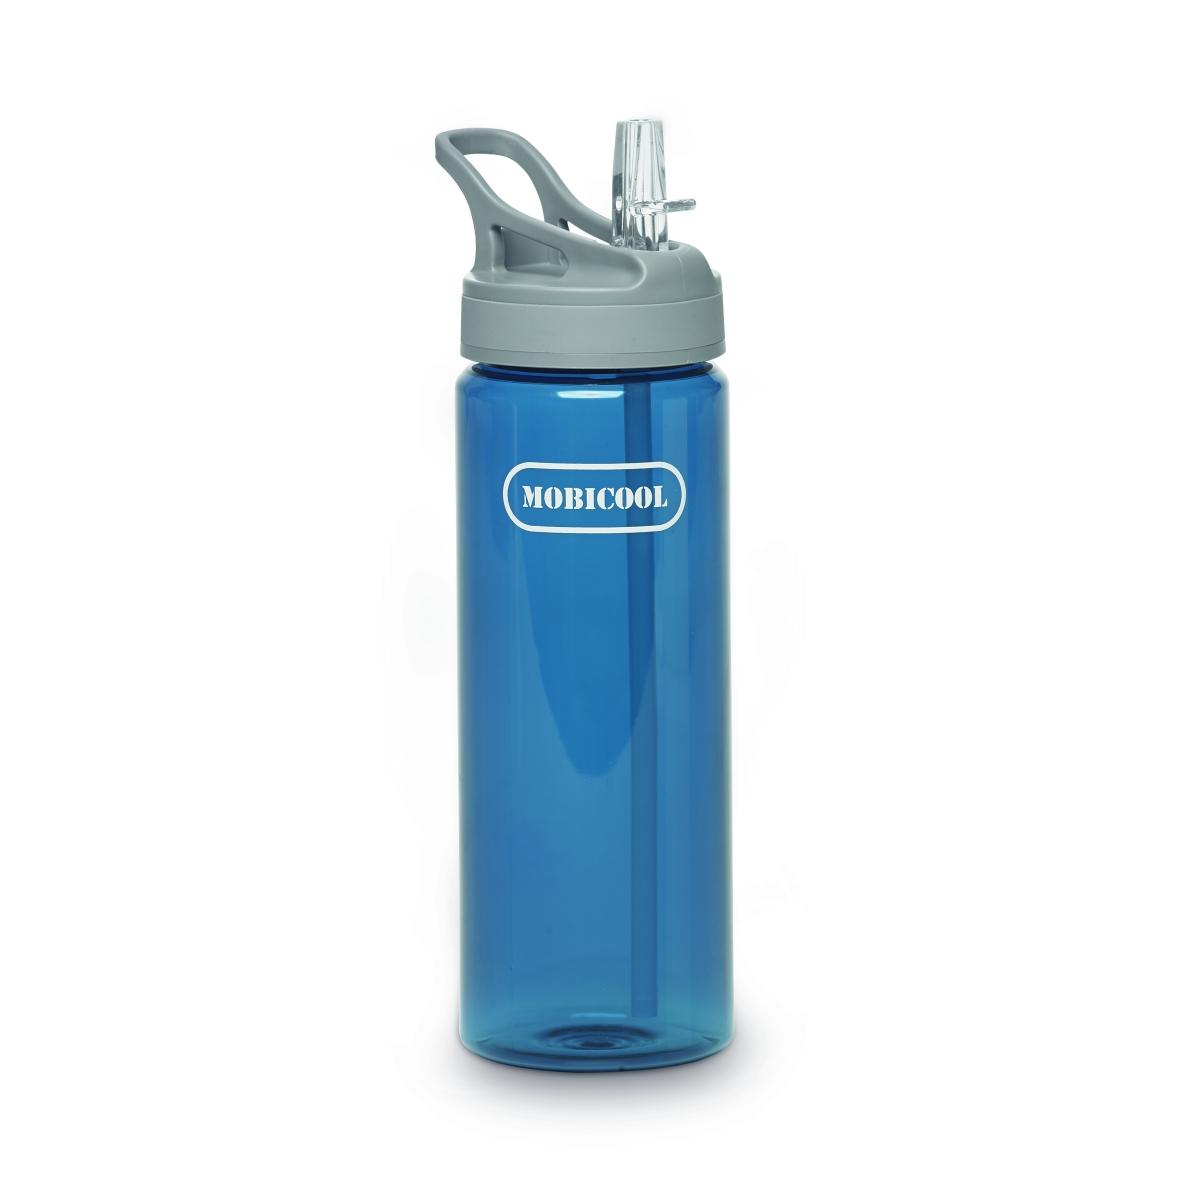 Mobicool Edelstahl-Trinkflasche MDI60 0,6l